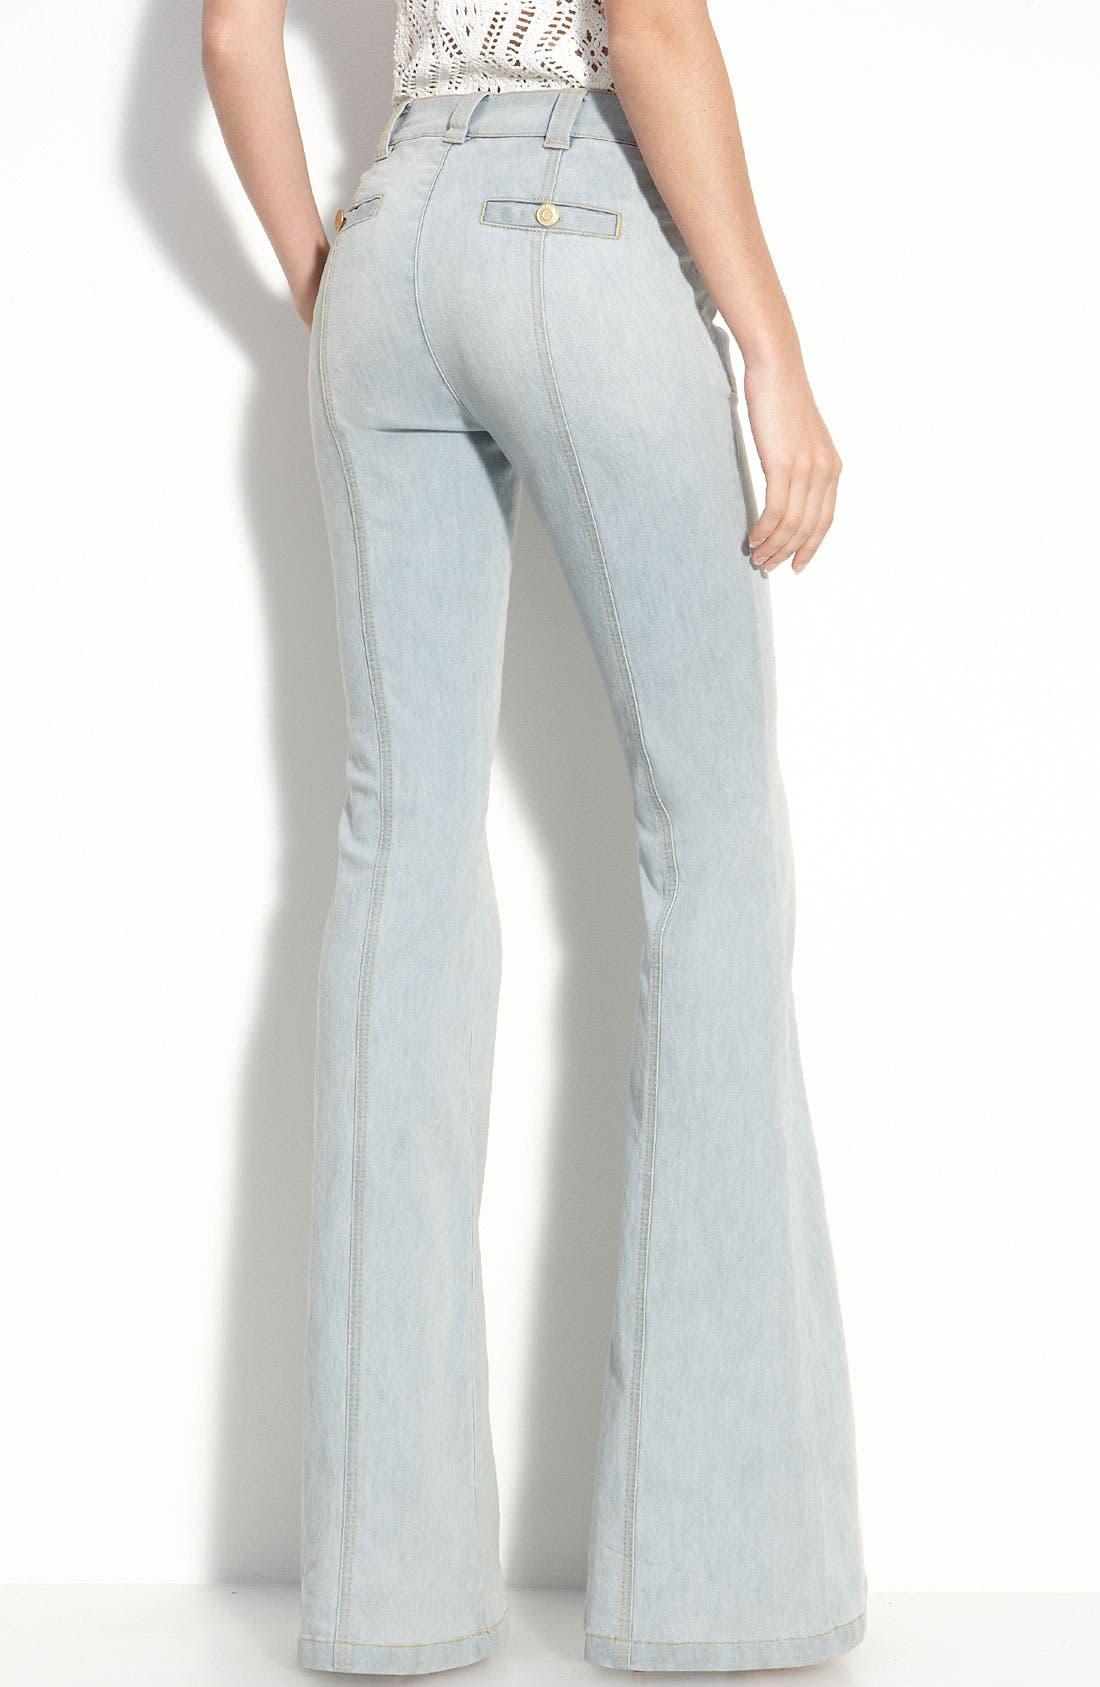 Alternate Image 1 Selected - Rachel Zoe 'Campbell' Flare Leg Stretch Jeans (Long)